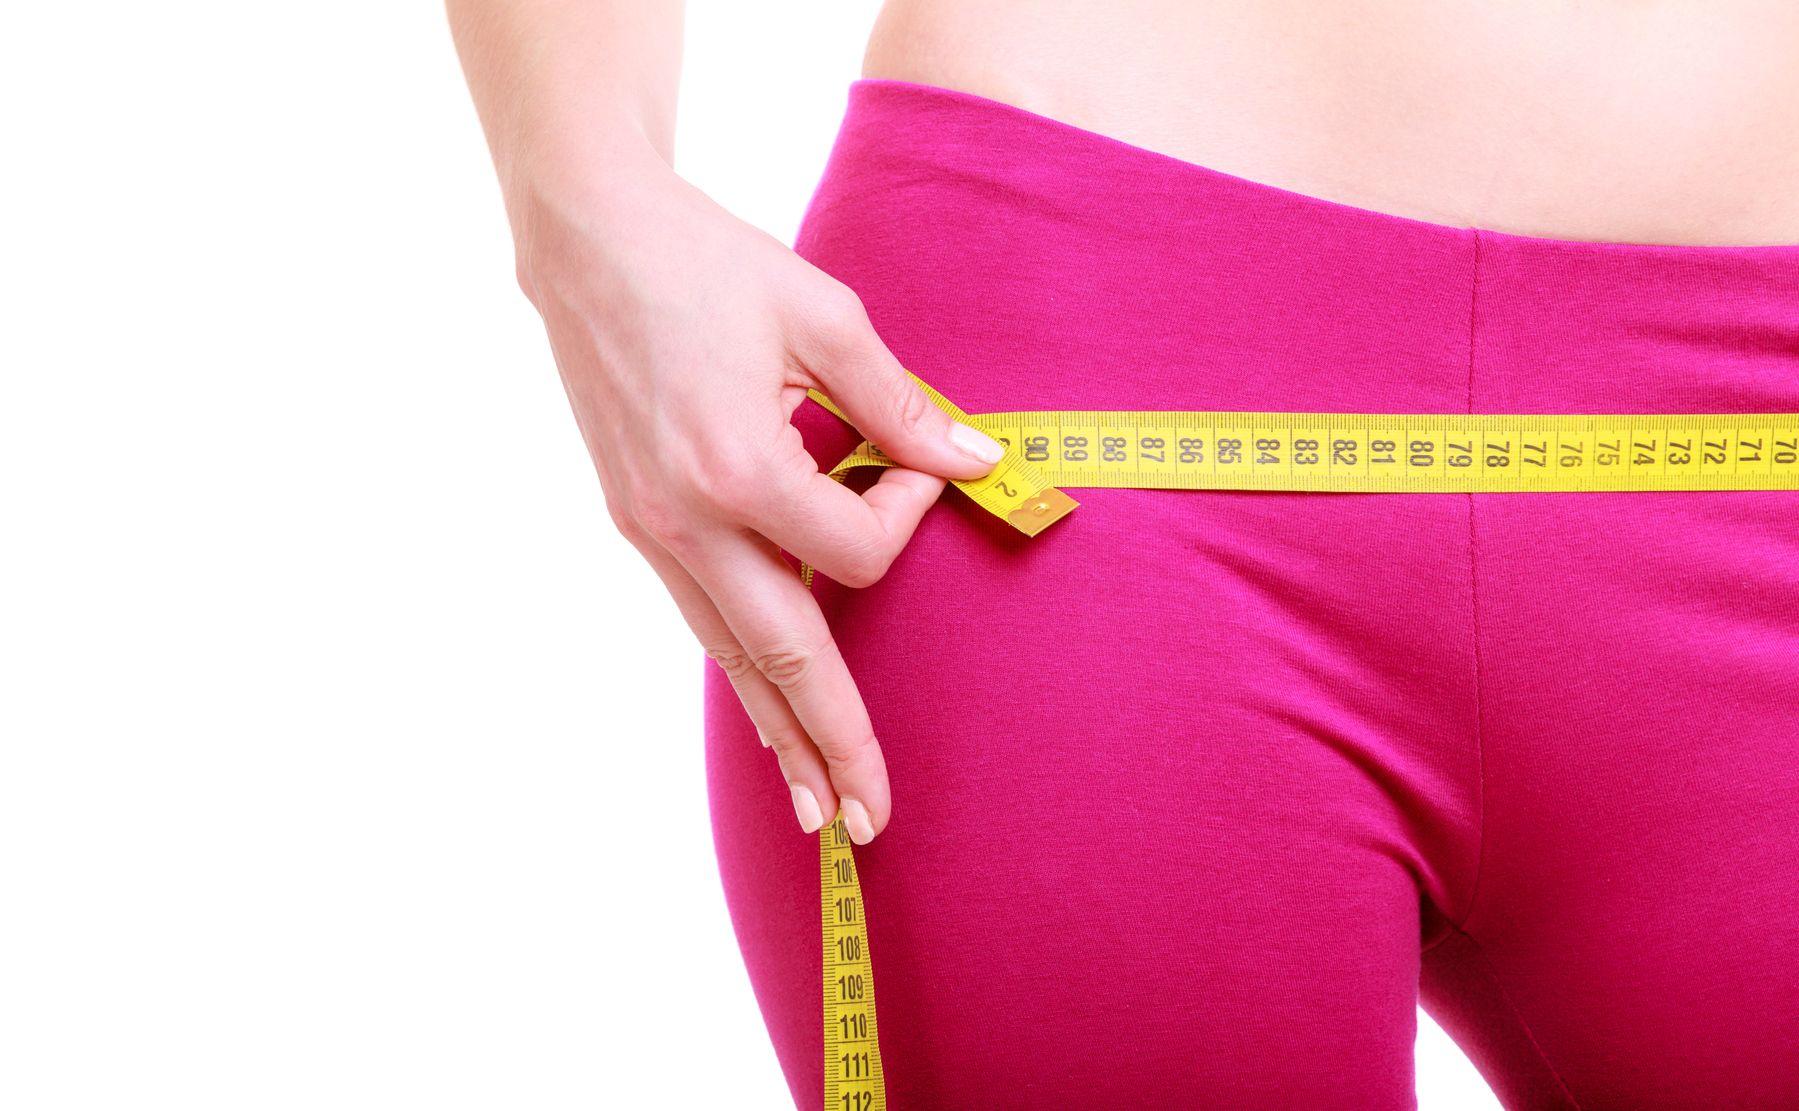 cell metabolism journal în corpul uman